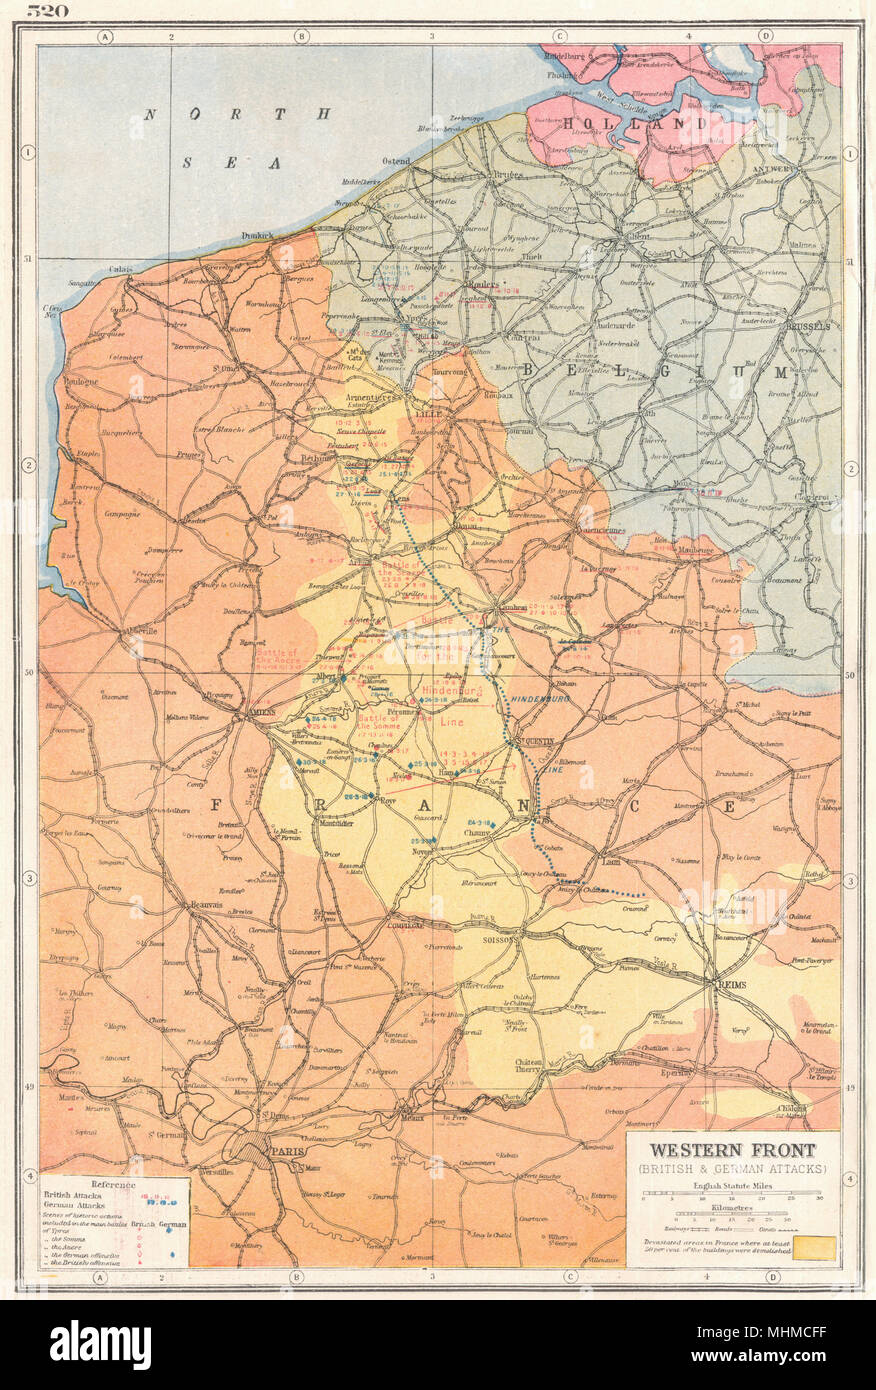 Map Of Western France.France Belgium Western Front First World War 1 Key Battles 1914 18